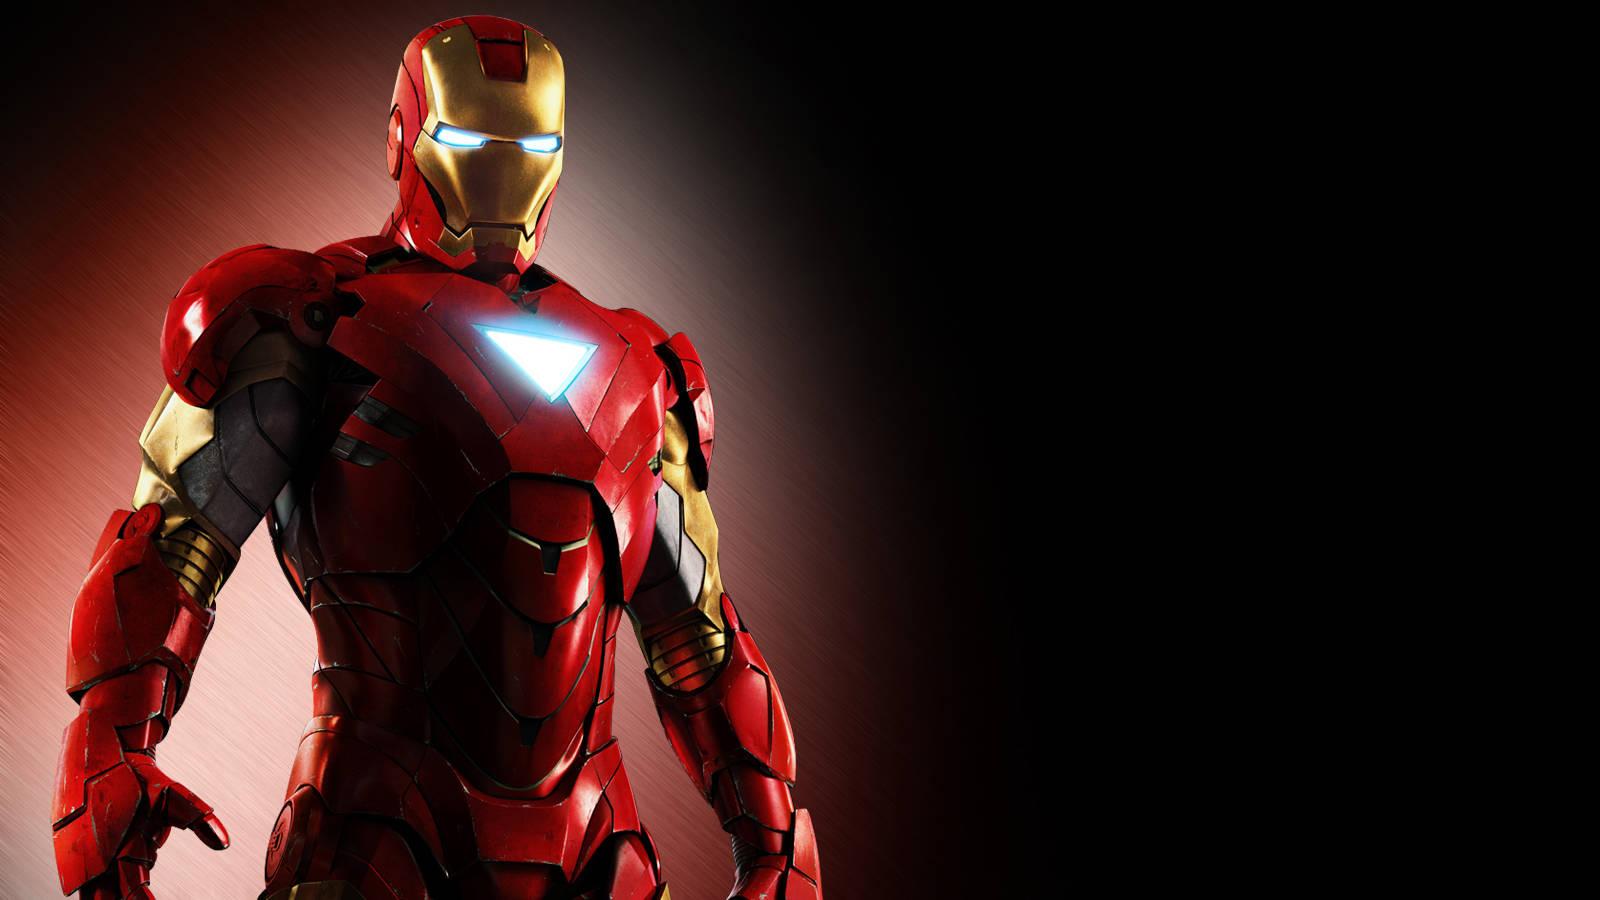 Iron Man 1600900 Wallpaper 1117034 1600x900